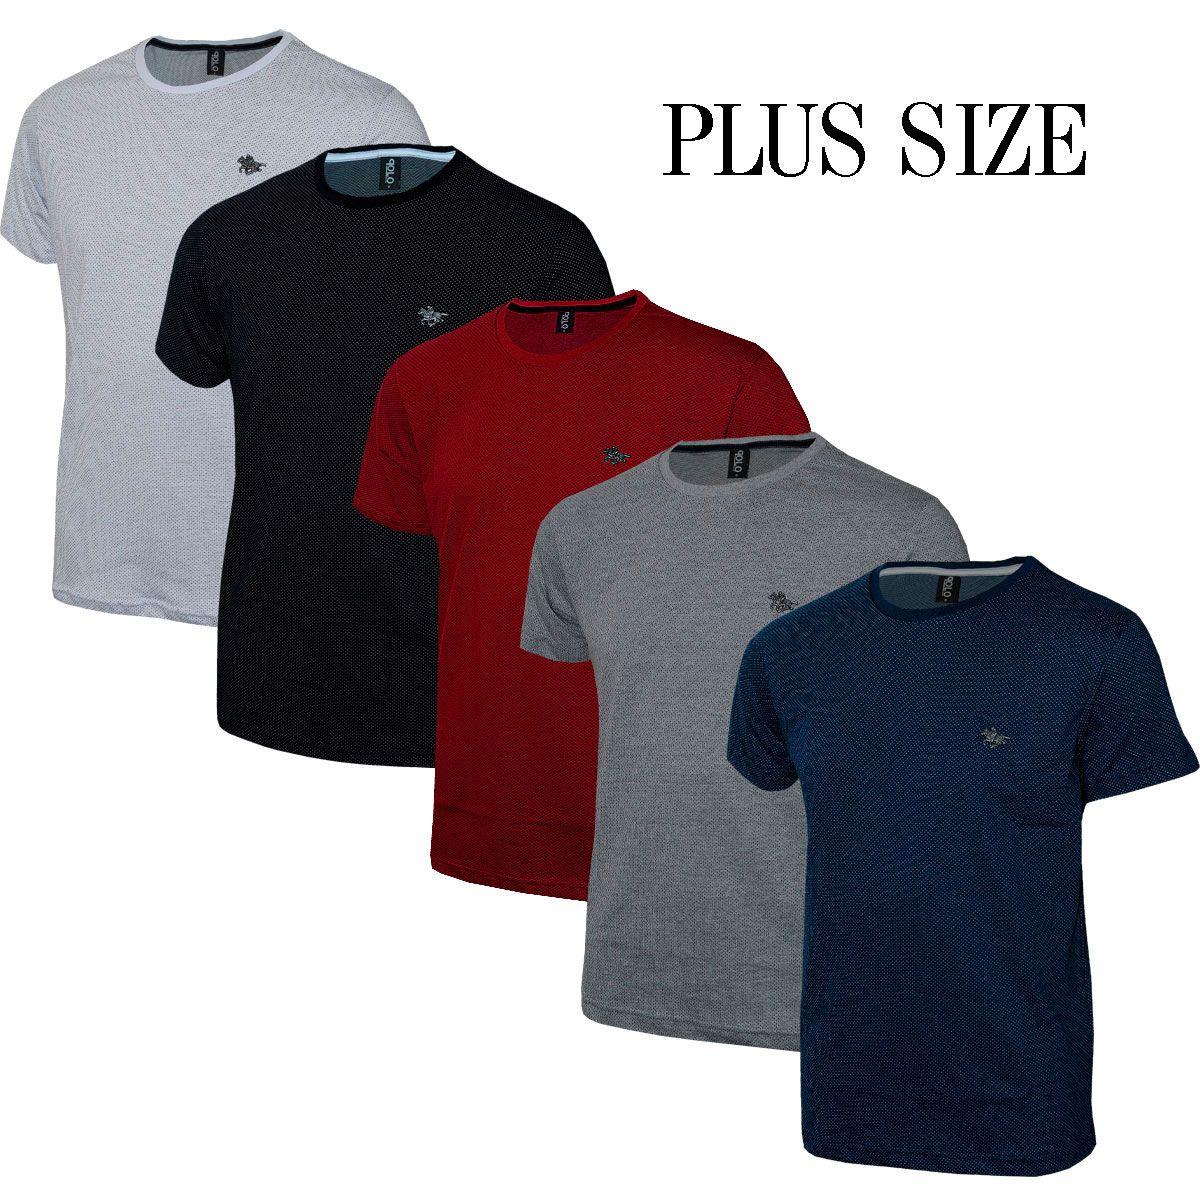 Kit Plus Size Camiseta Masculina em Malha Pontilhada e Cavalo em Metal